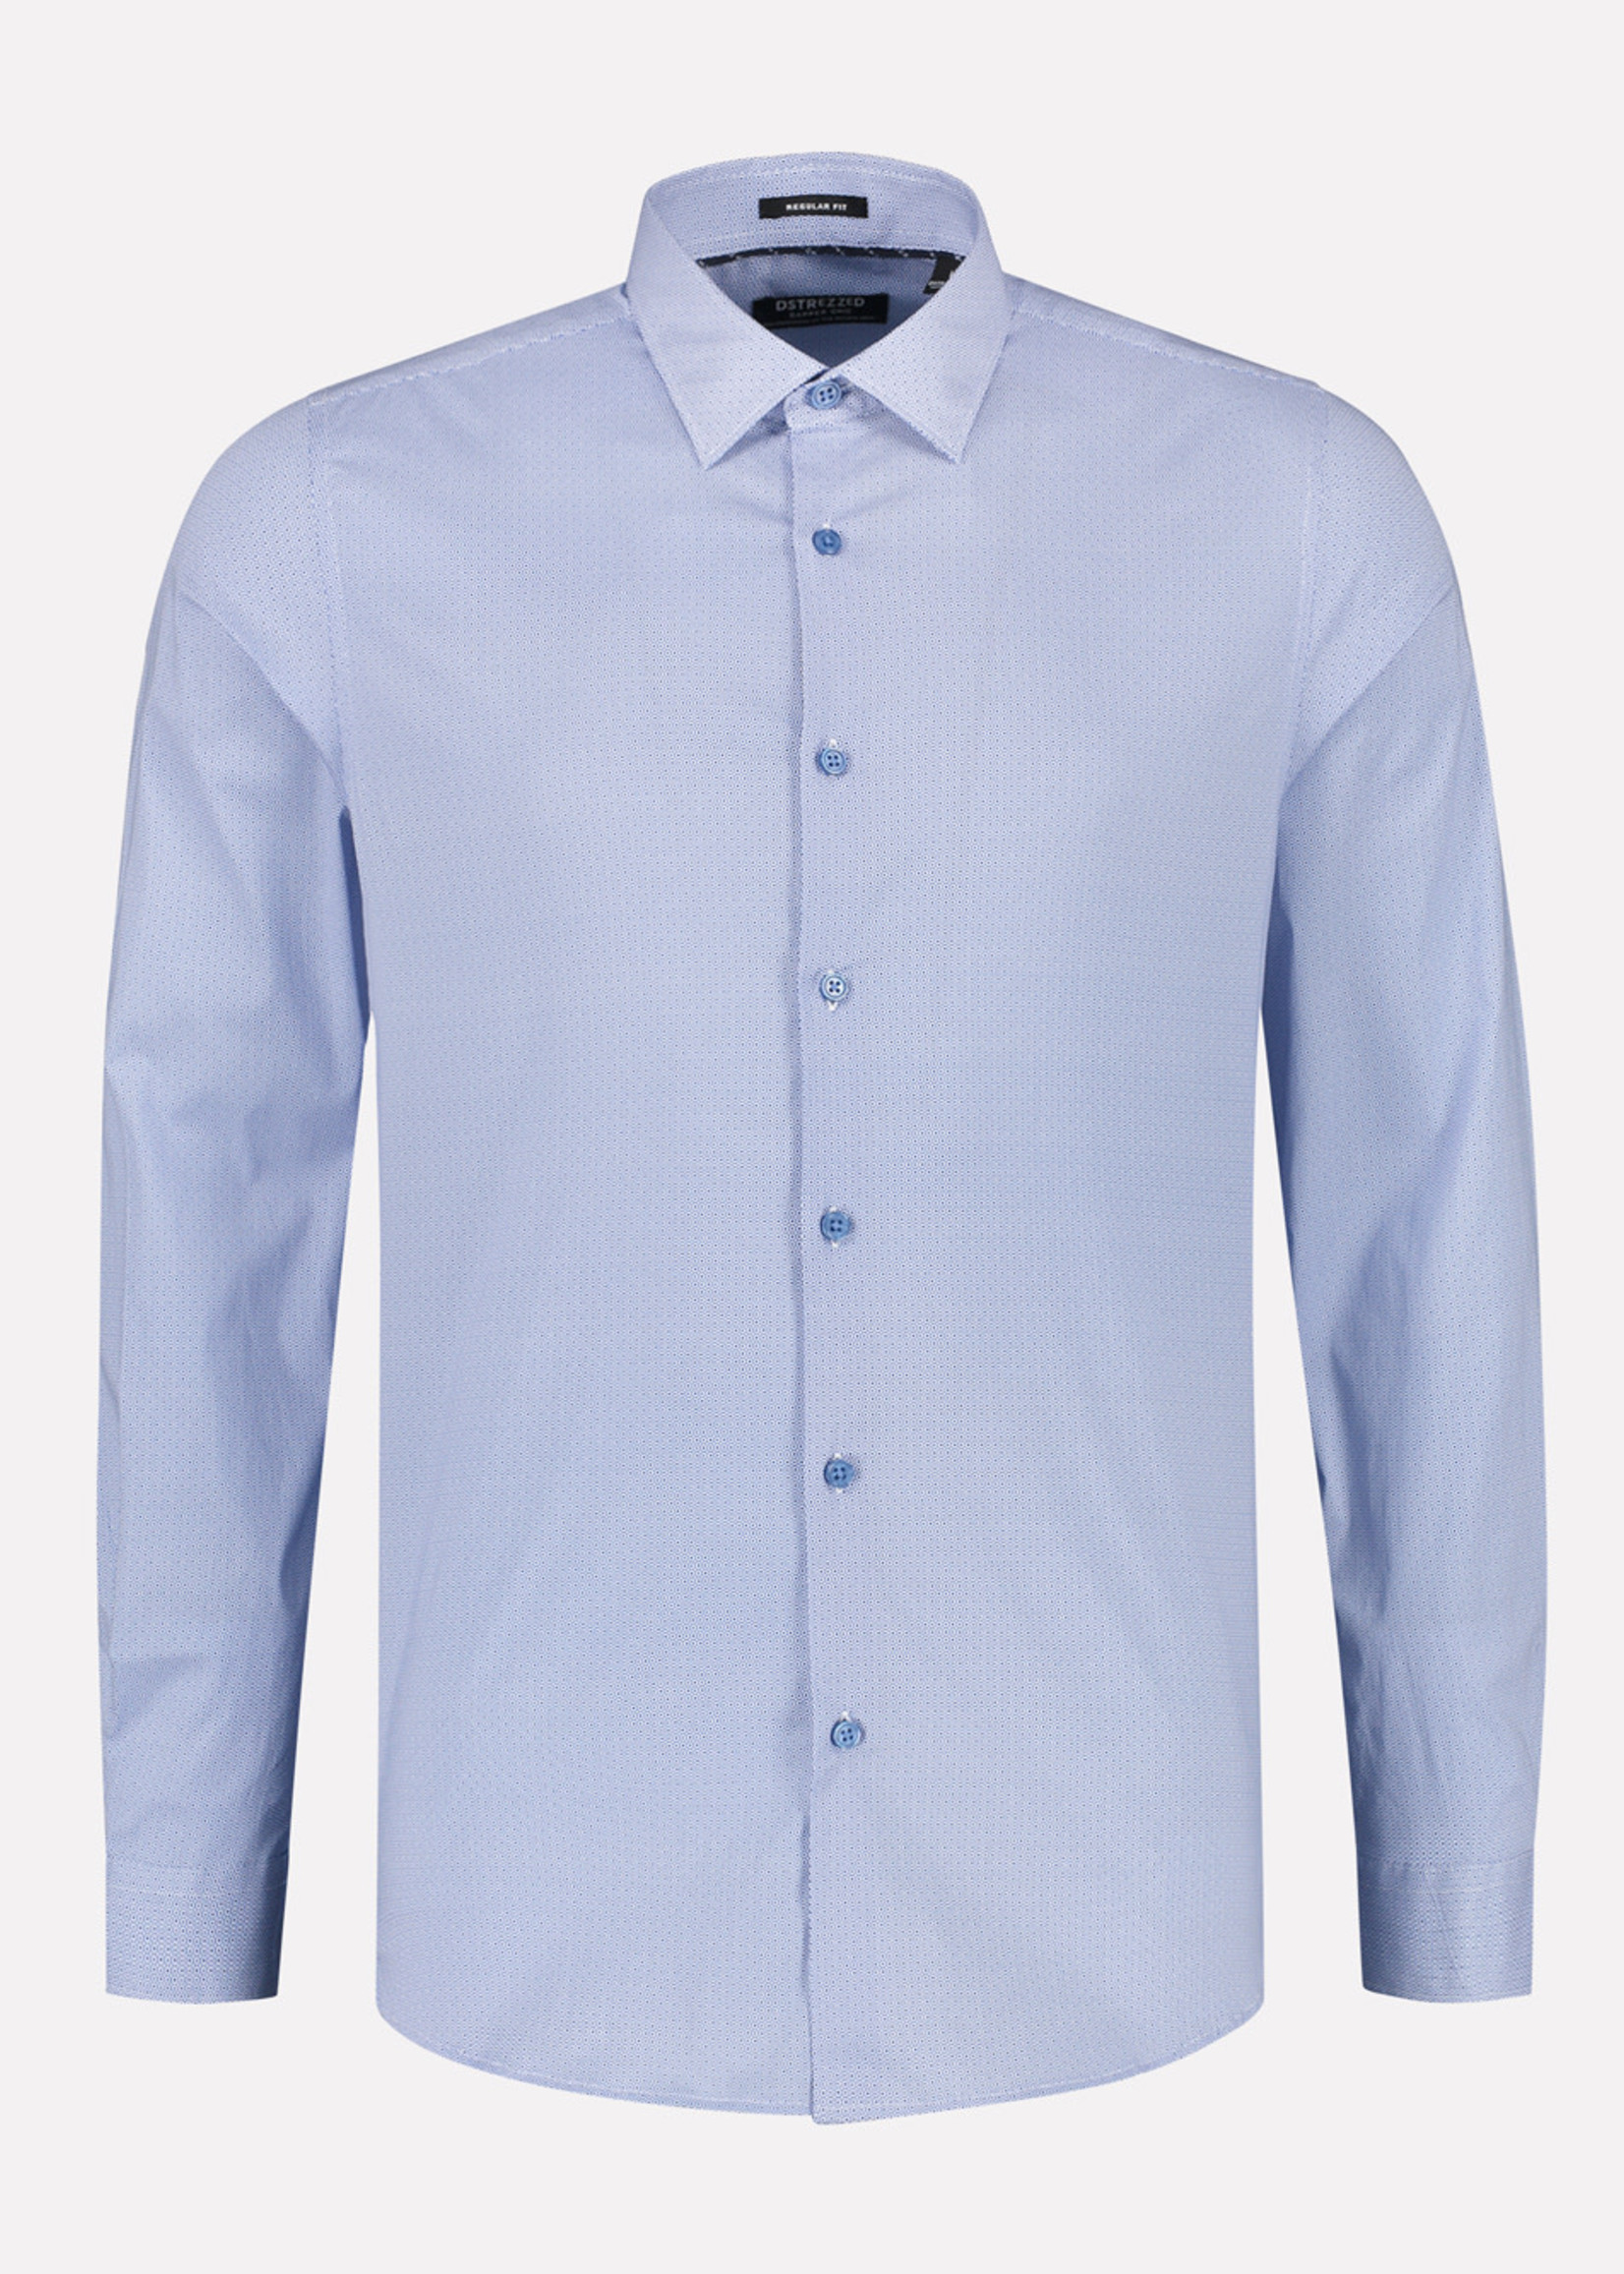 Dstrezzed Overhemd met fantasie patroon | Blauw | Dstrezzed